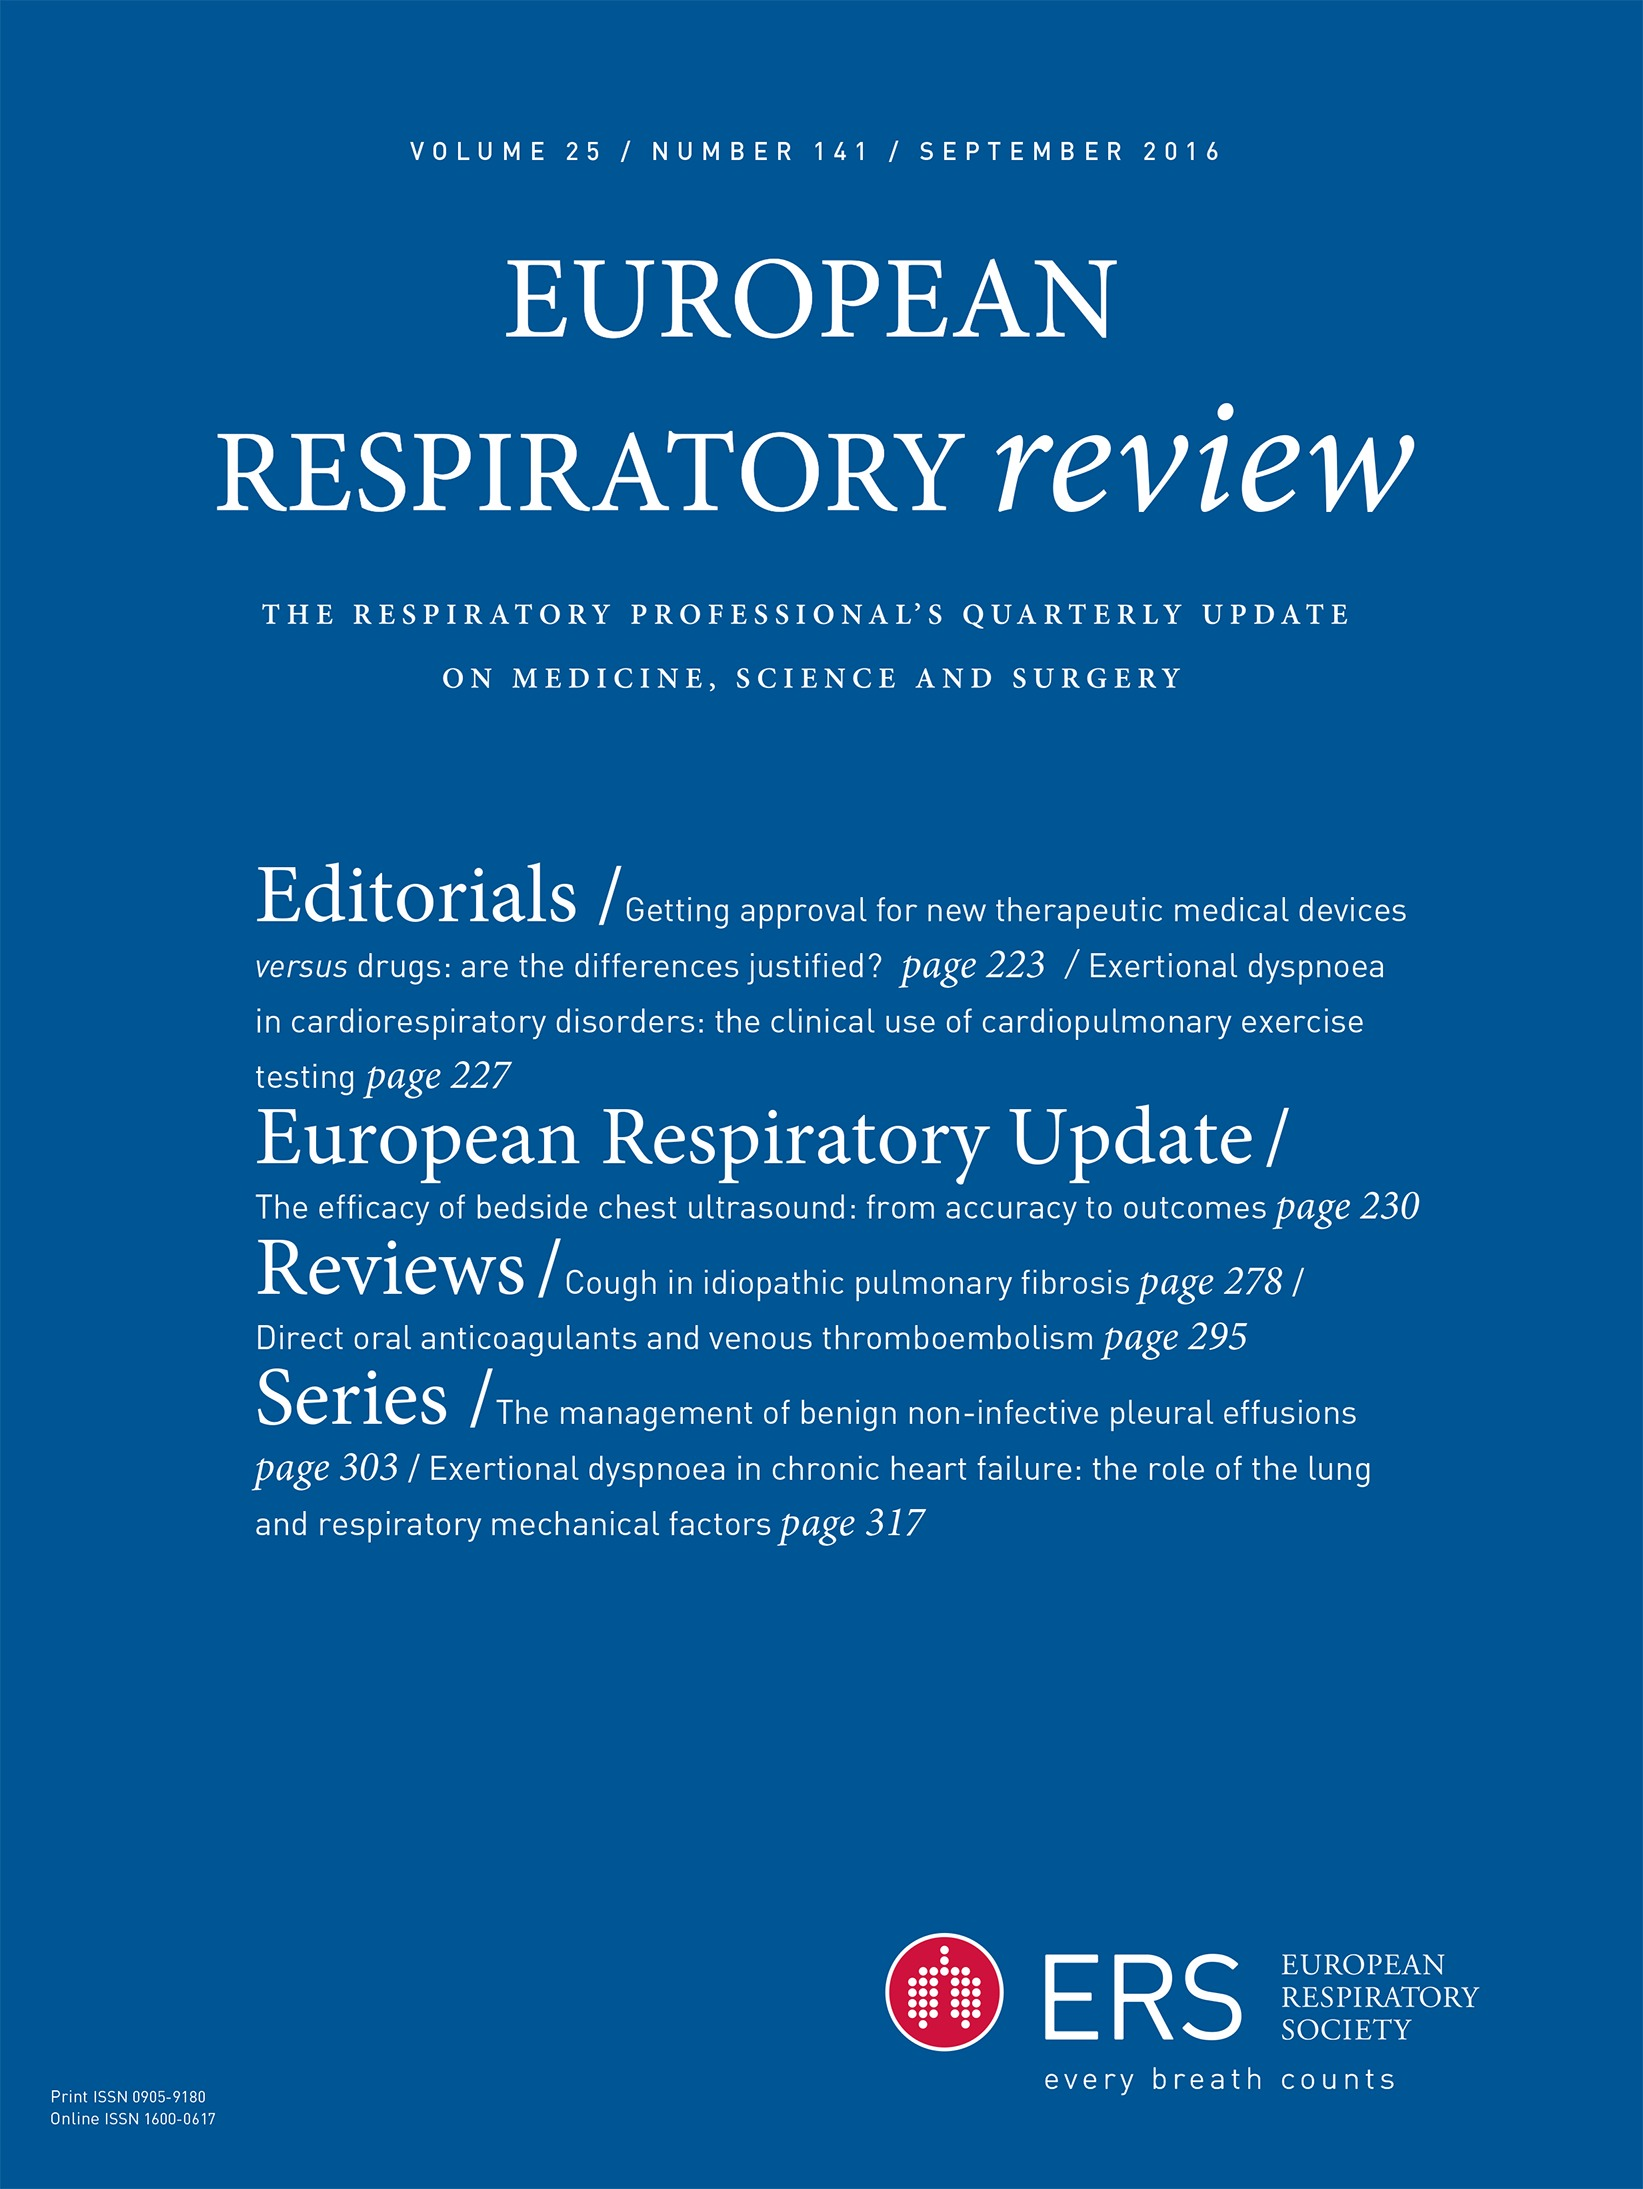 Supple Persistent Cough Prednisone Wheezing Cough Coughing Idiopathic Pulmonary Fibrosis European Respiratory Society Prednisone bark post Prednisone For Cough